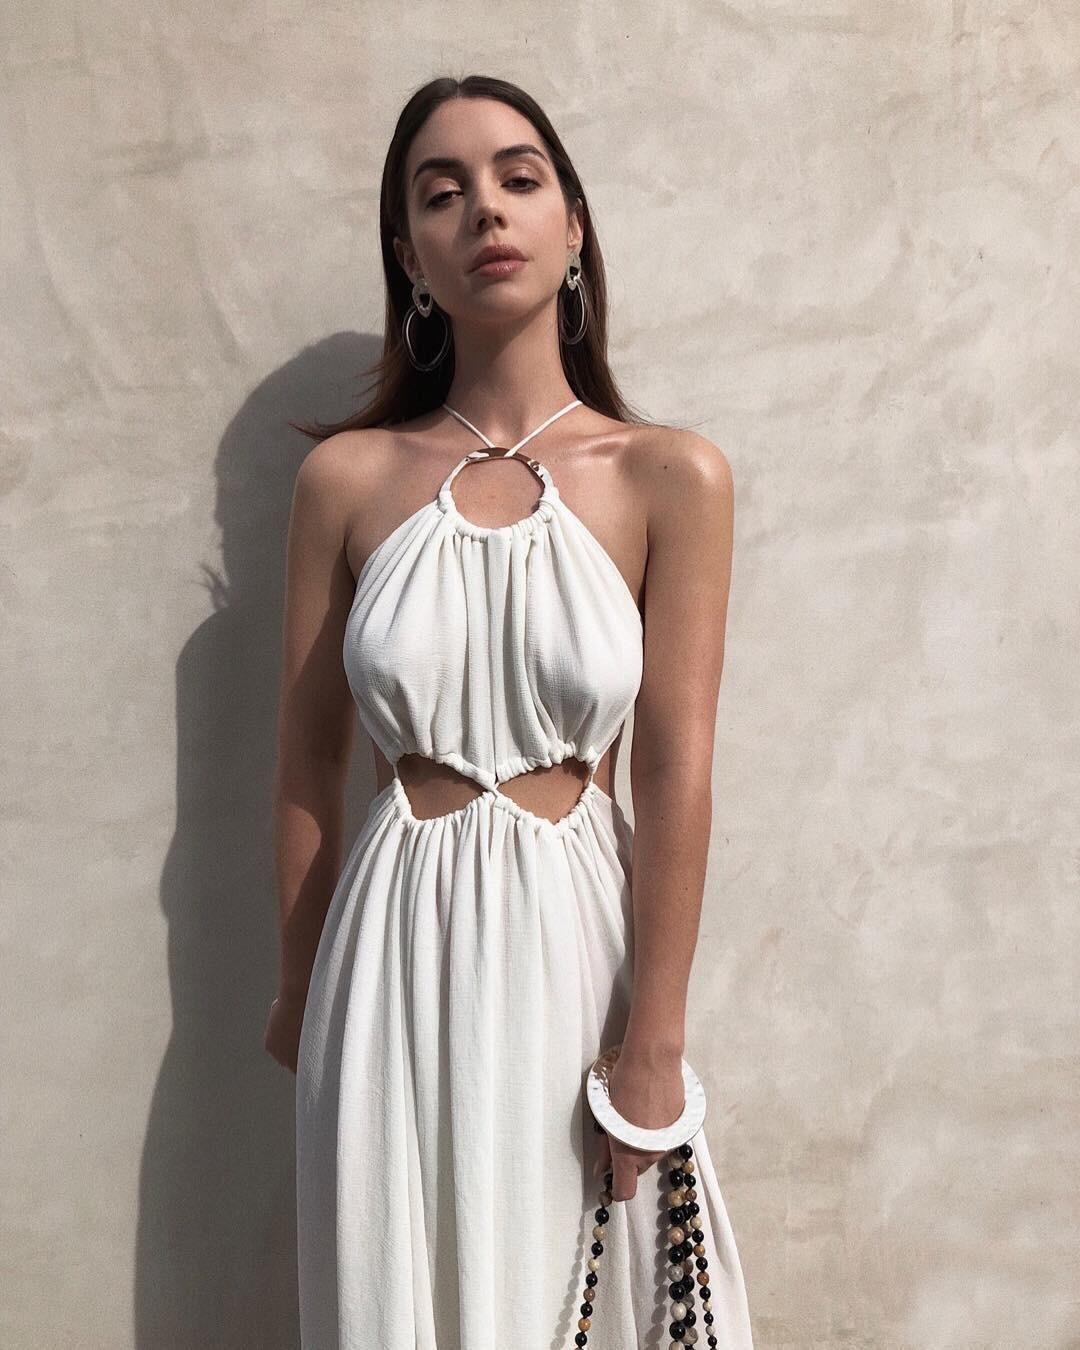 b126ae1be43cc8 Adelaide Kane | YSMM Wedding in 2019 | Adelaide kane, Dresses ...